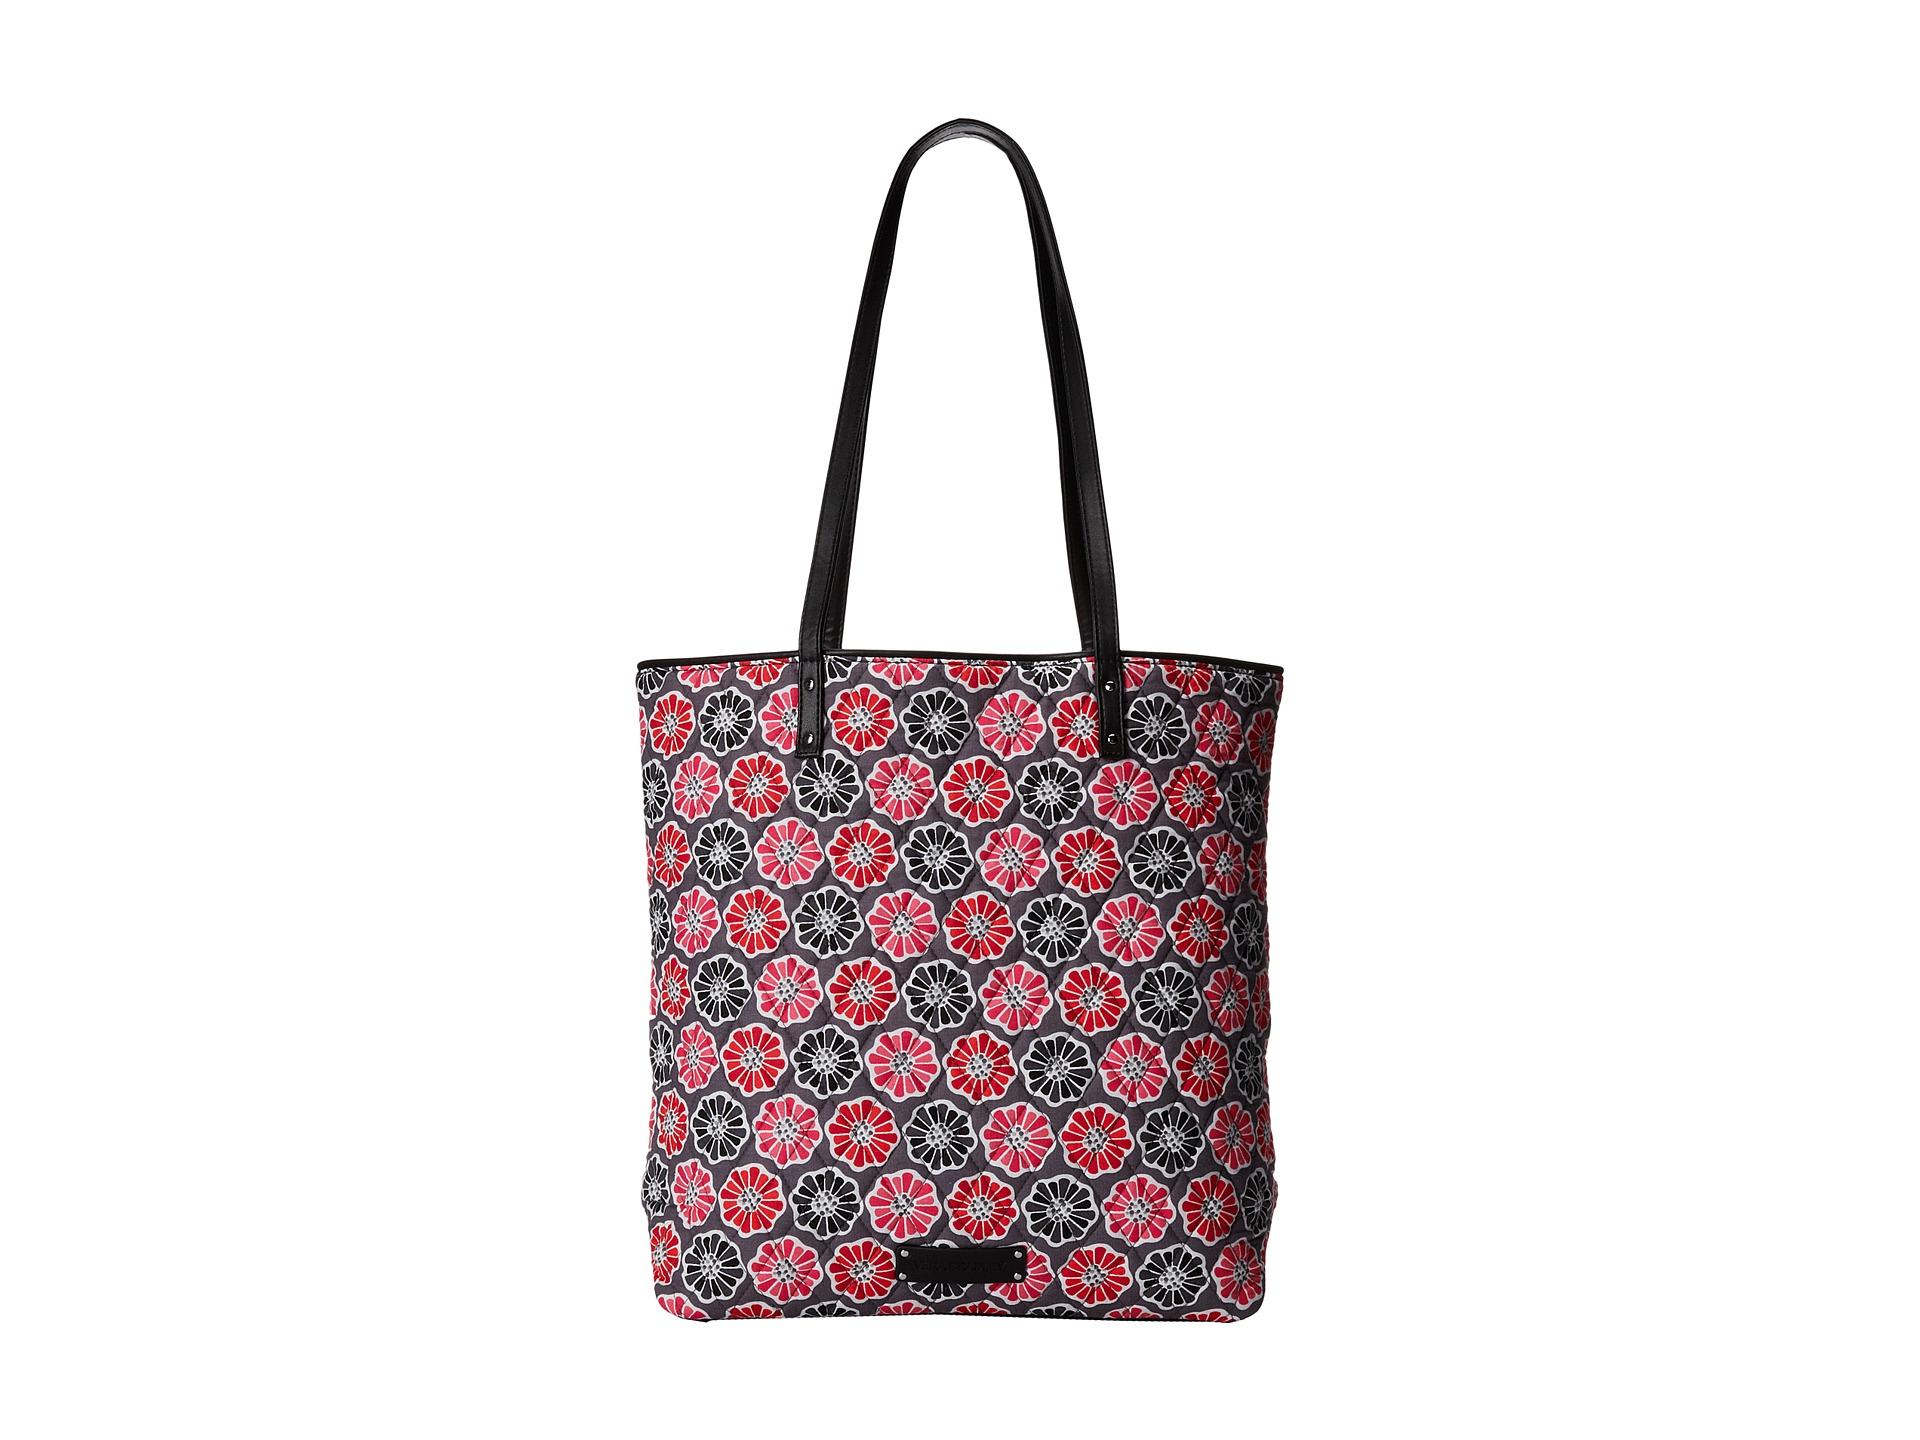 vera bradley 100 handbag dimensions for kentucky